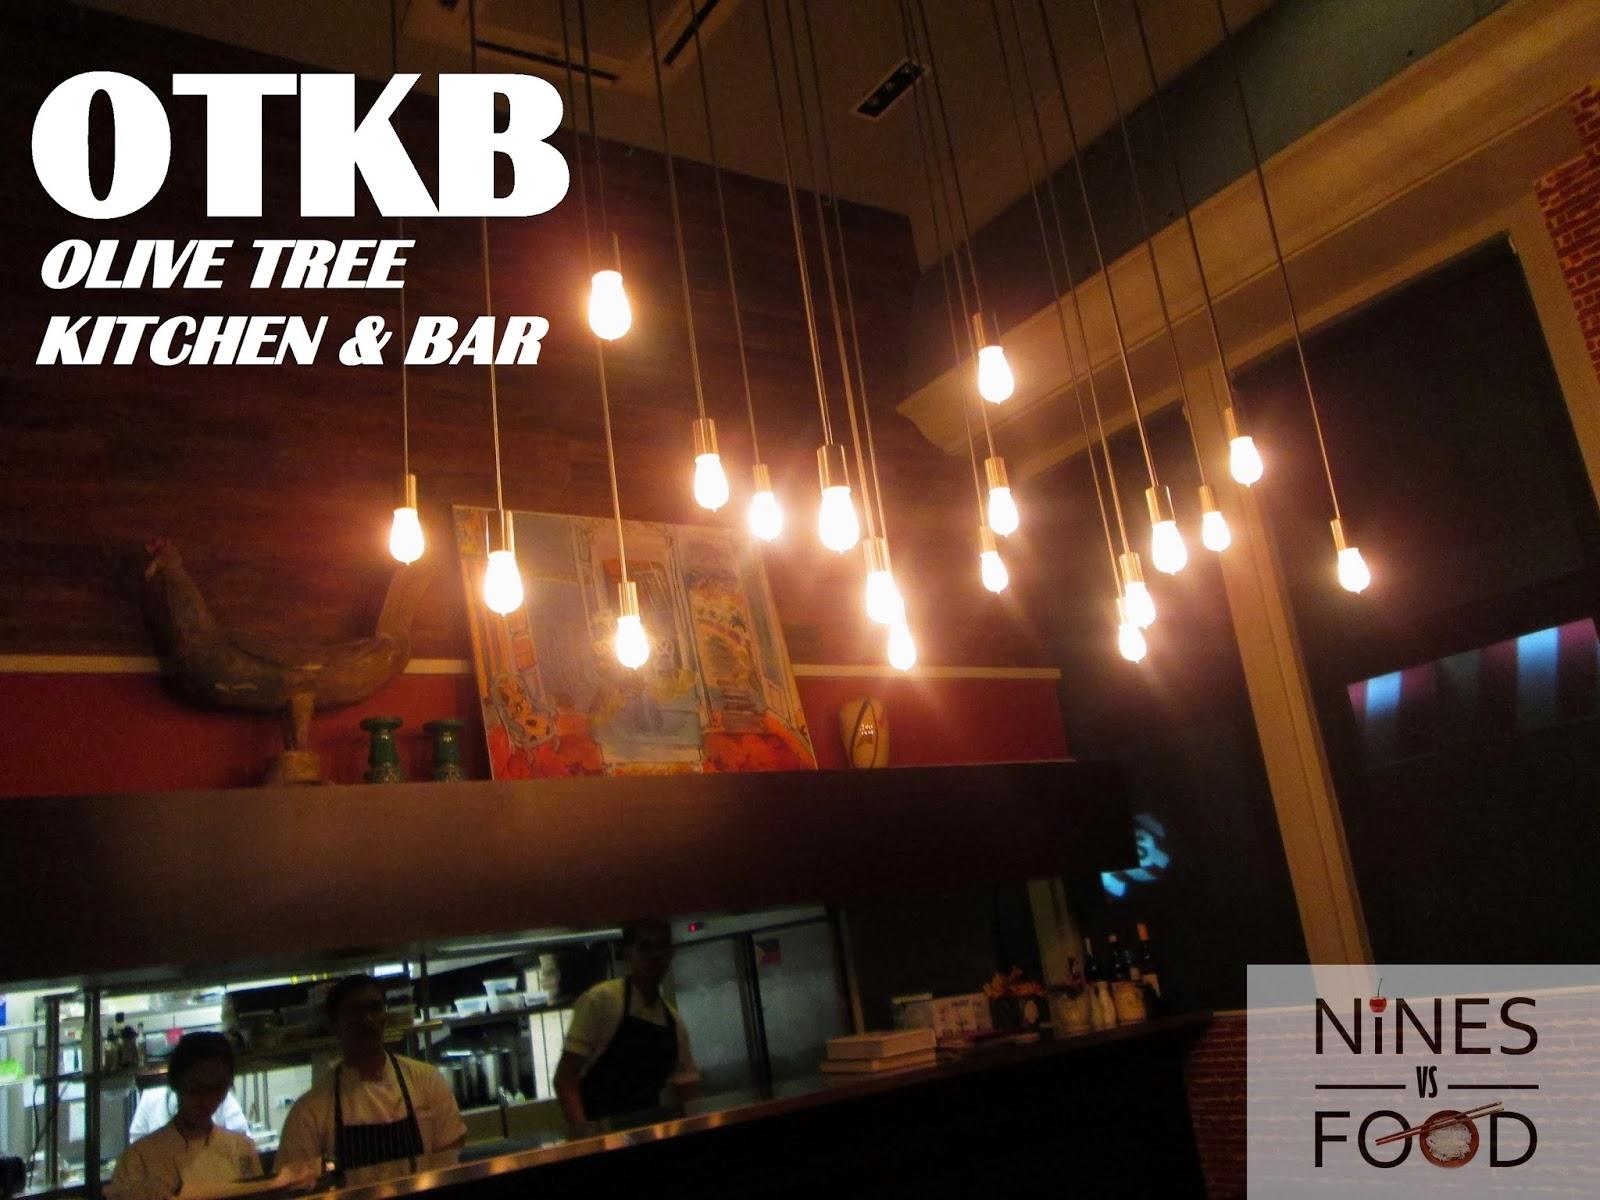 Nines vs. Food - Olive Tree Kitchen and Bar-1.jpg